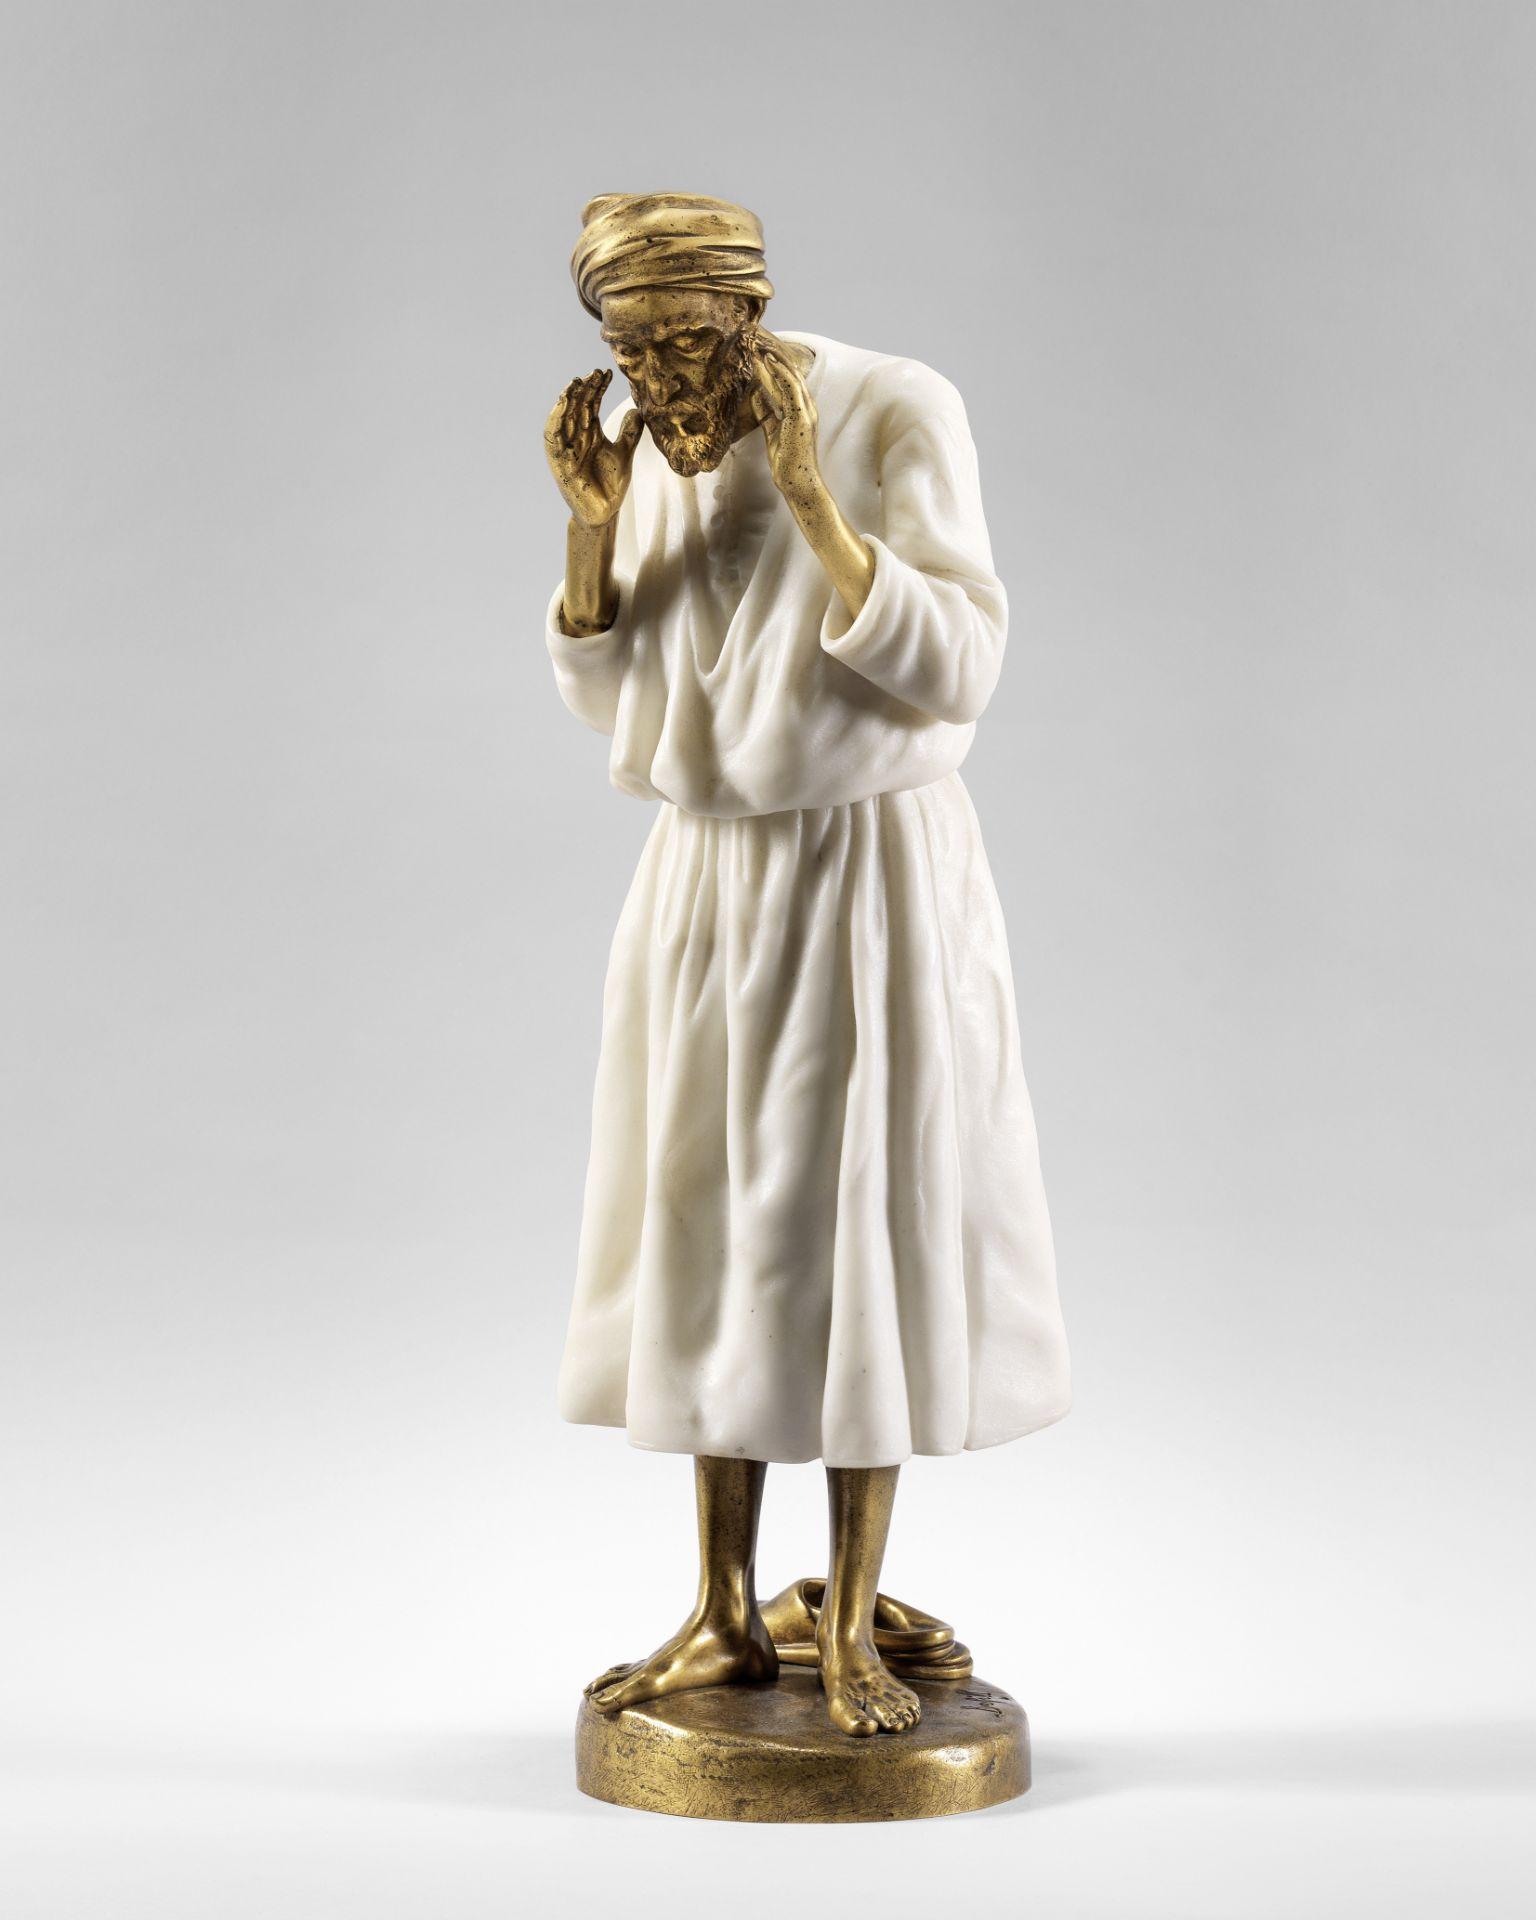 Antoine Bofill (Spanish, 1875-1921) Arabe en prière 50cm high (19 1/2in high)